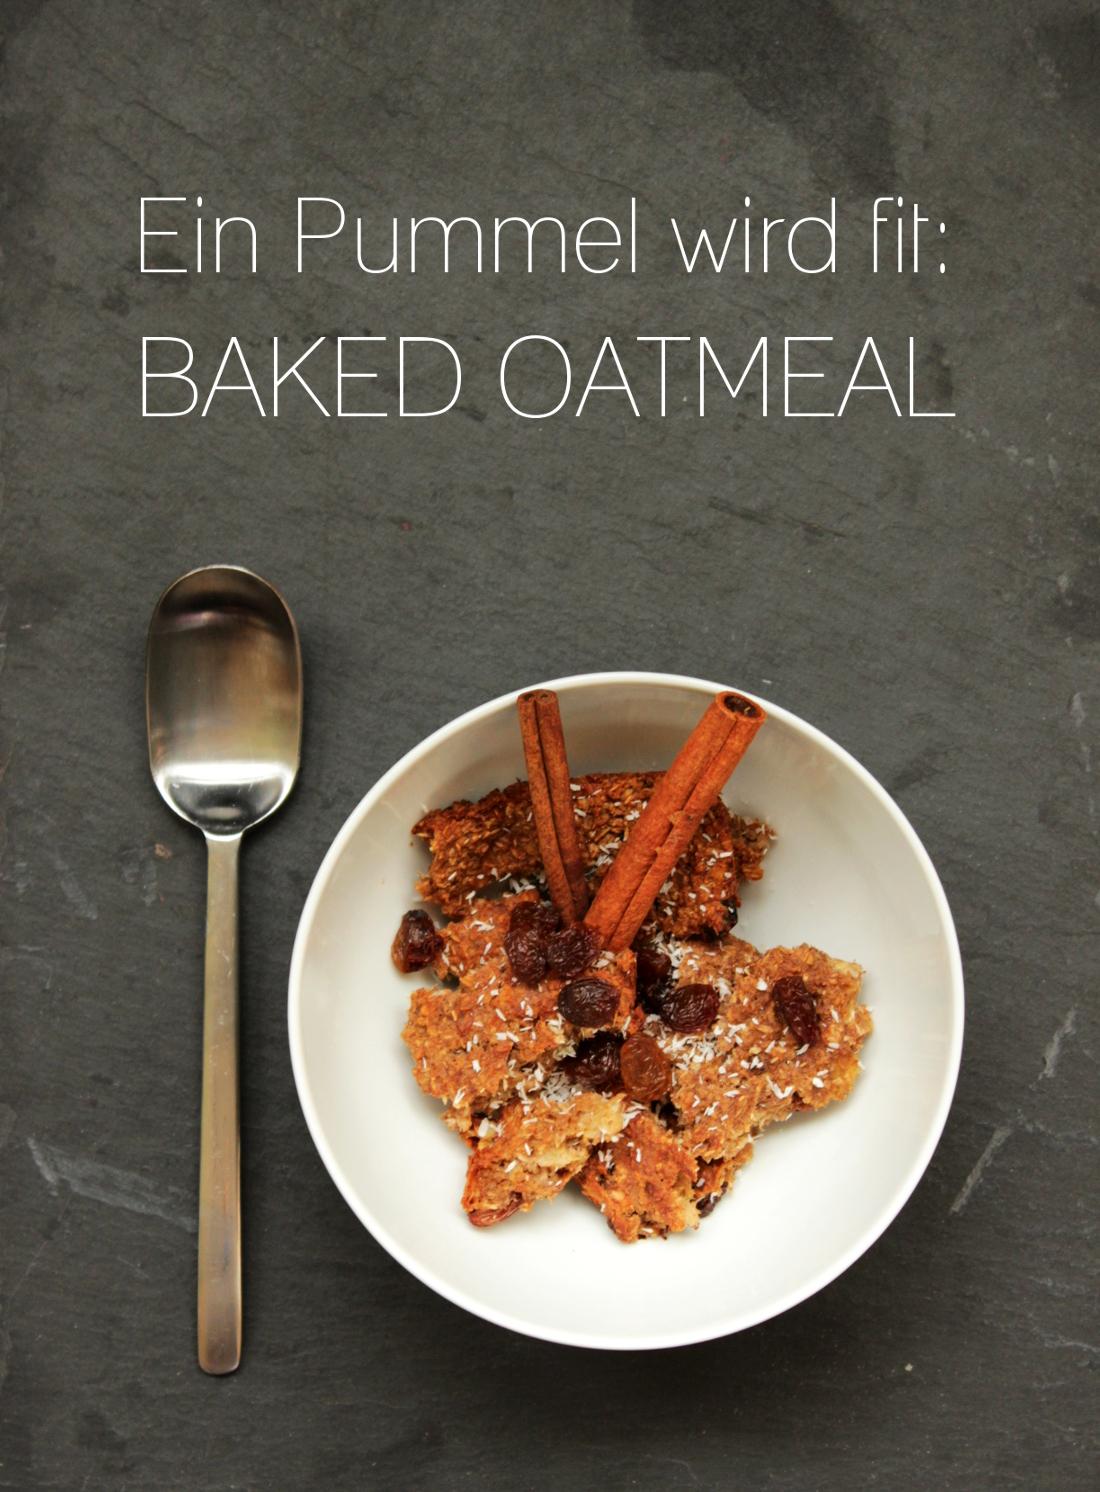 Baked Oatmeal ohne Zucker